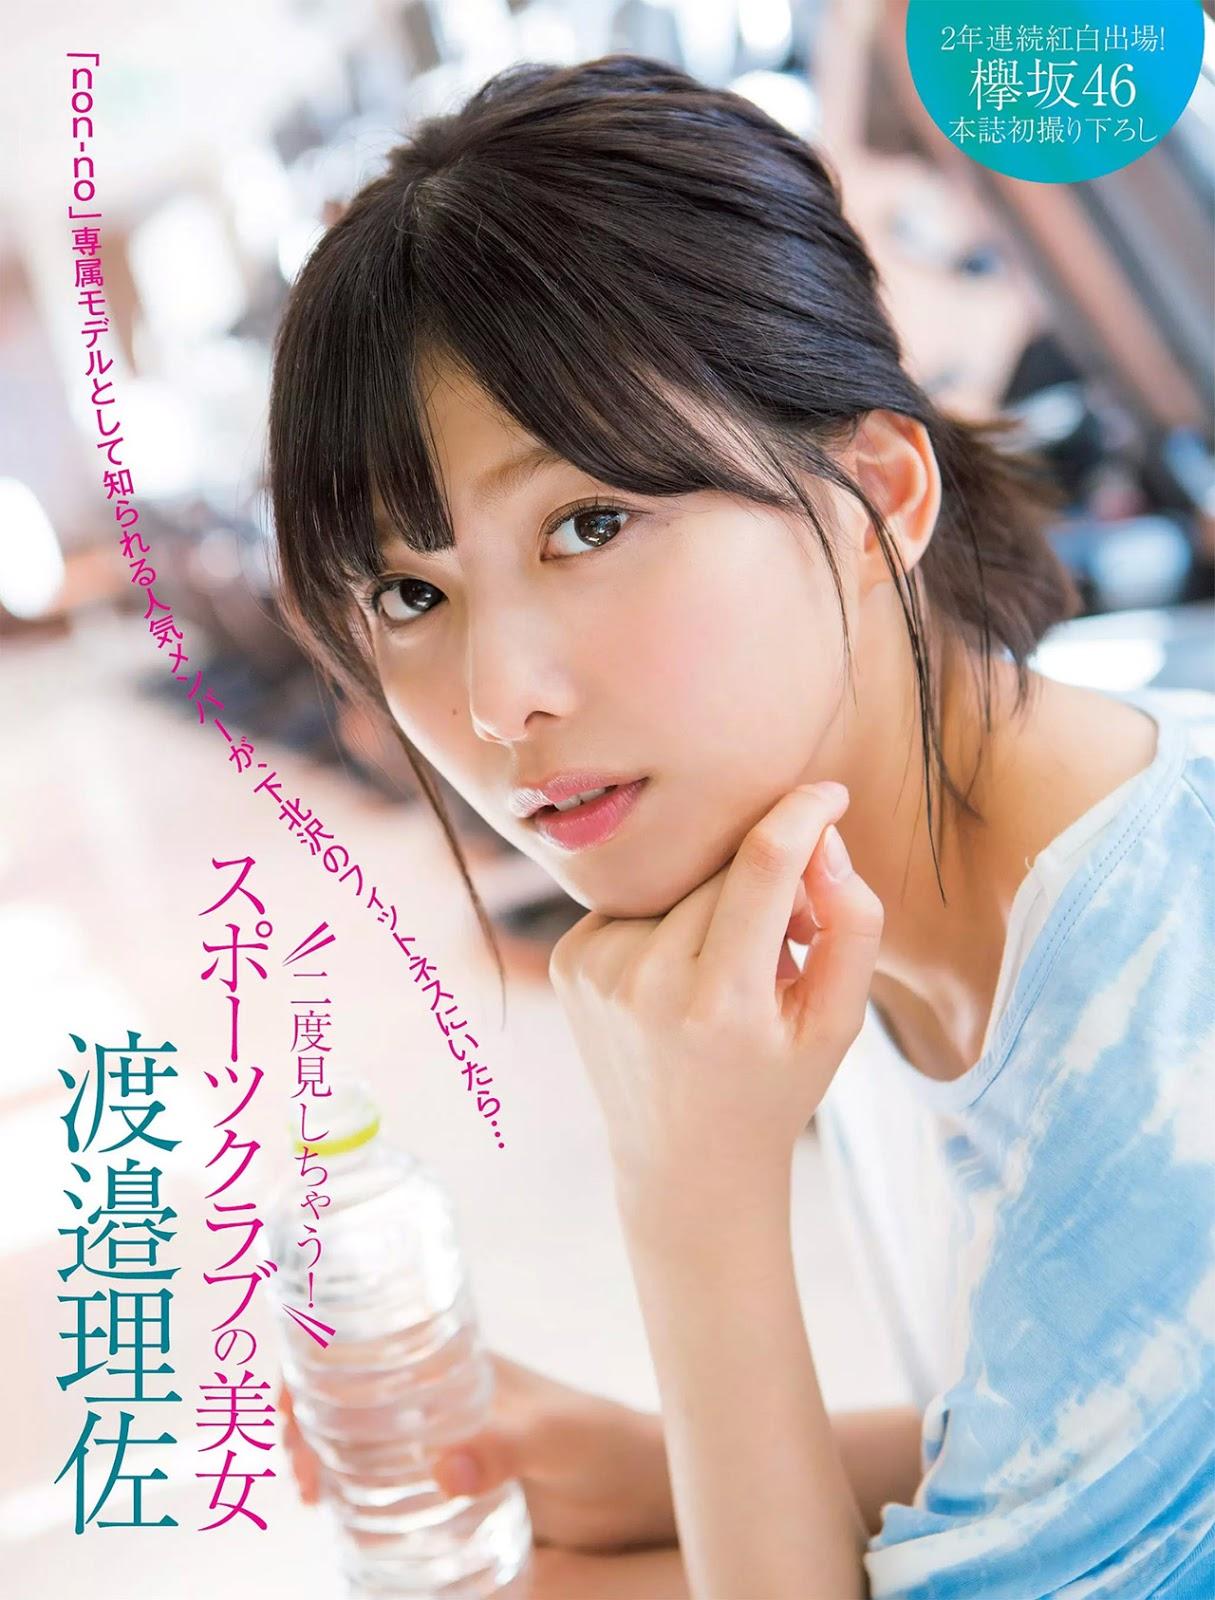 Watanabe Risa 渡邉理佐, FLASH 電子版 2017.12.19 (フラッシュ 2017年12月19日号)